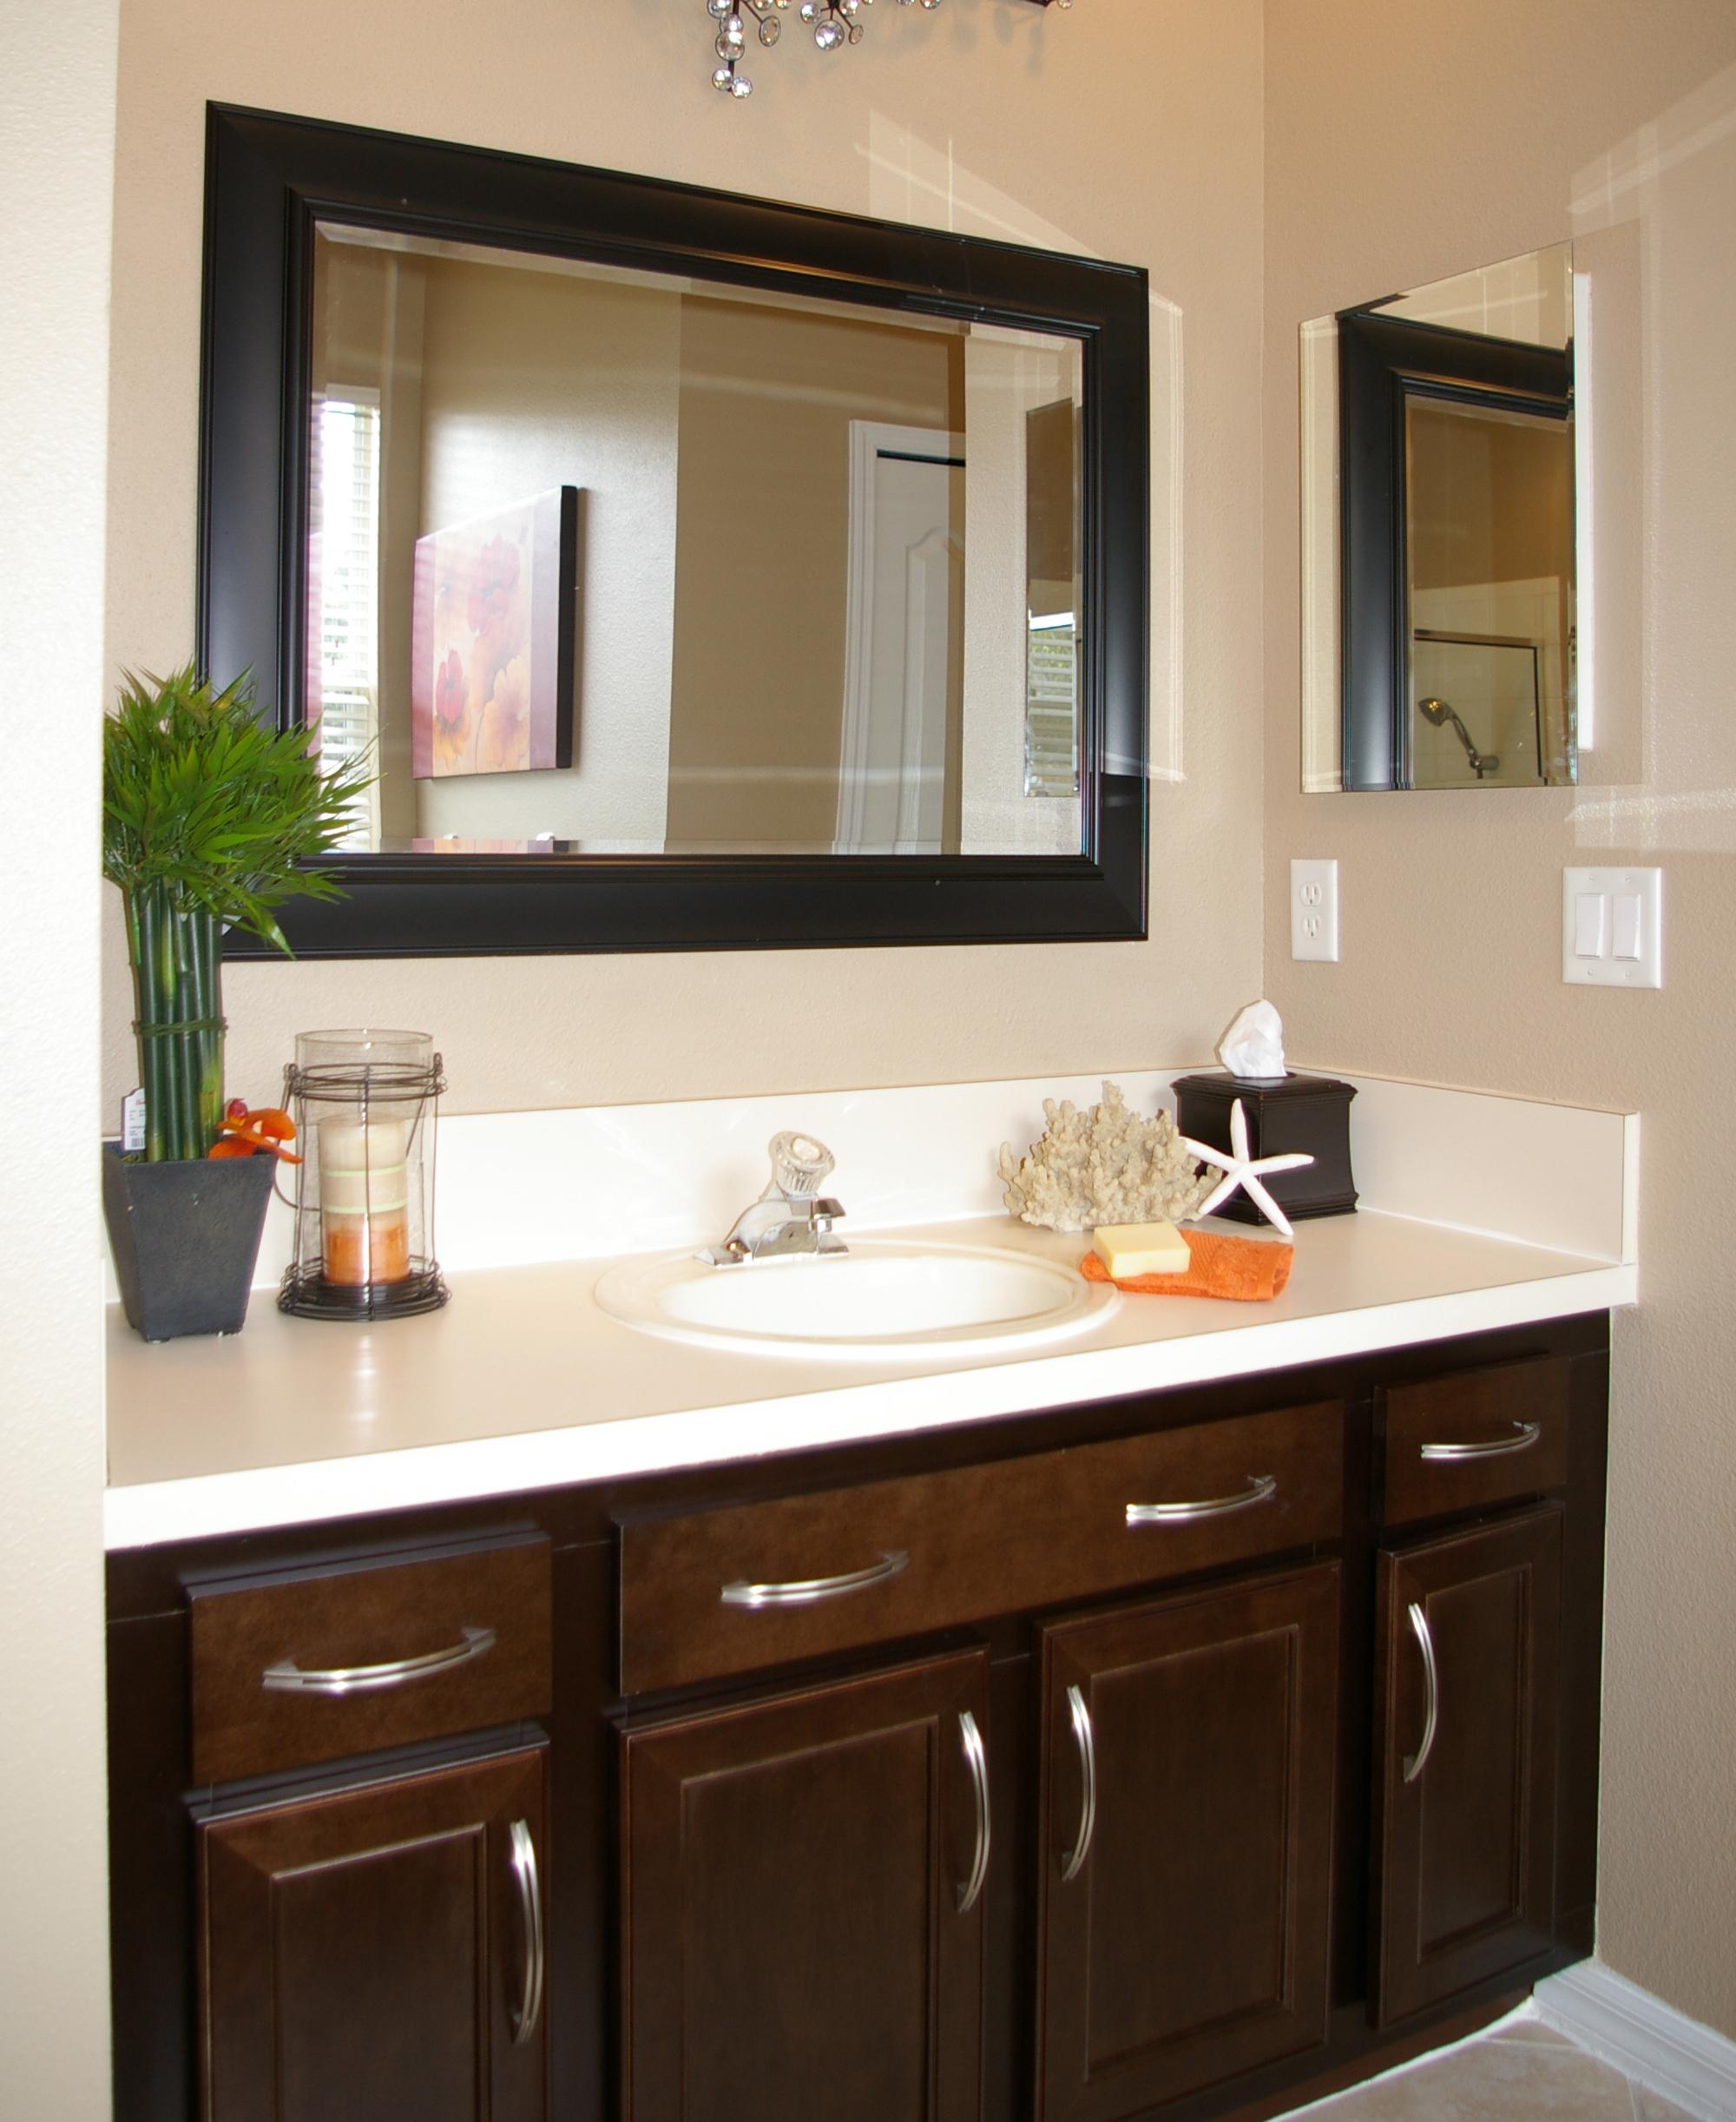 Home Depot Bathroom Designs